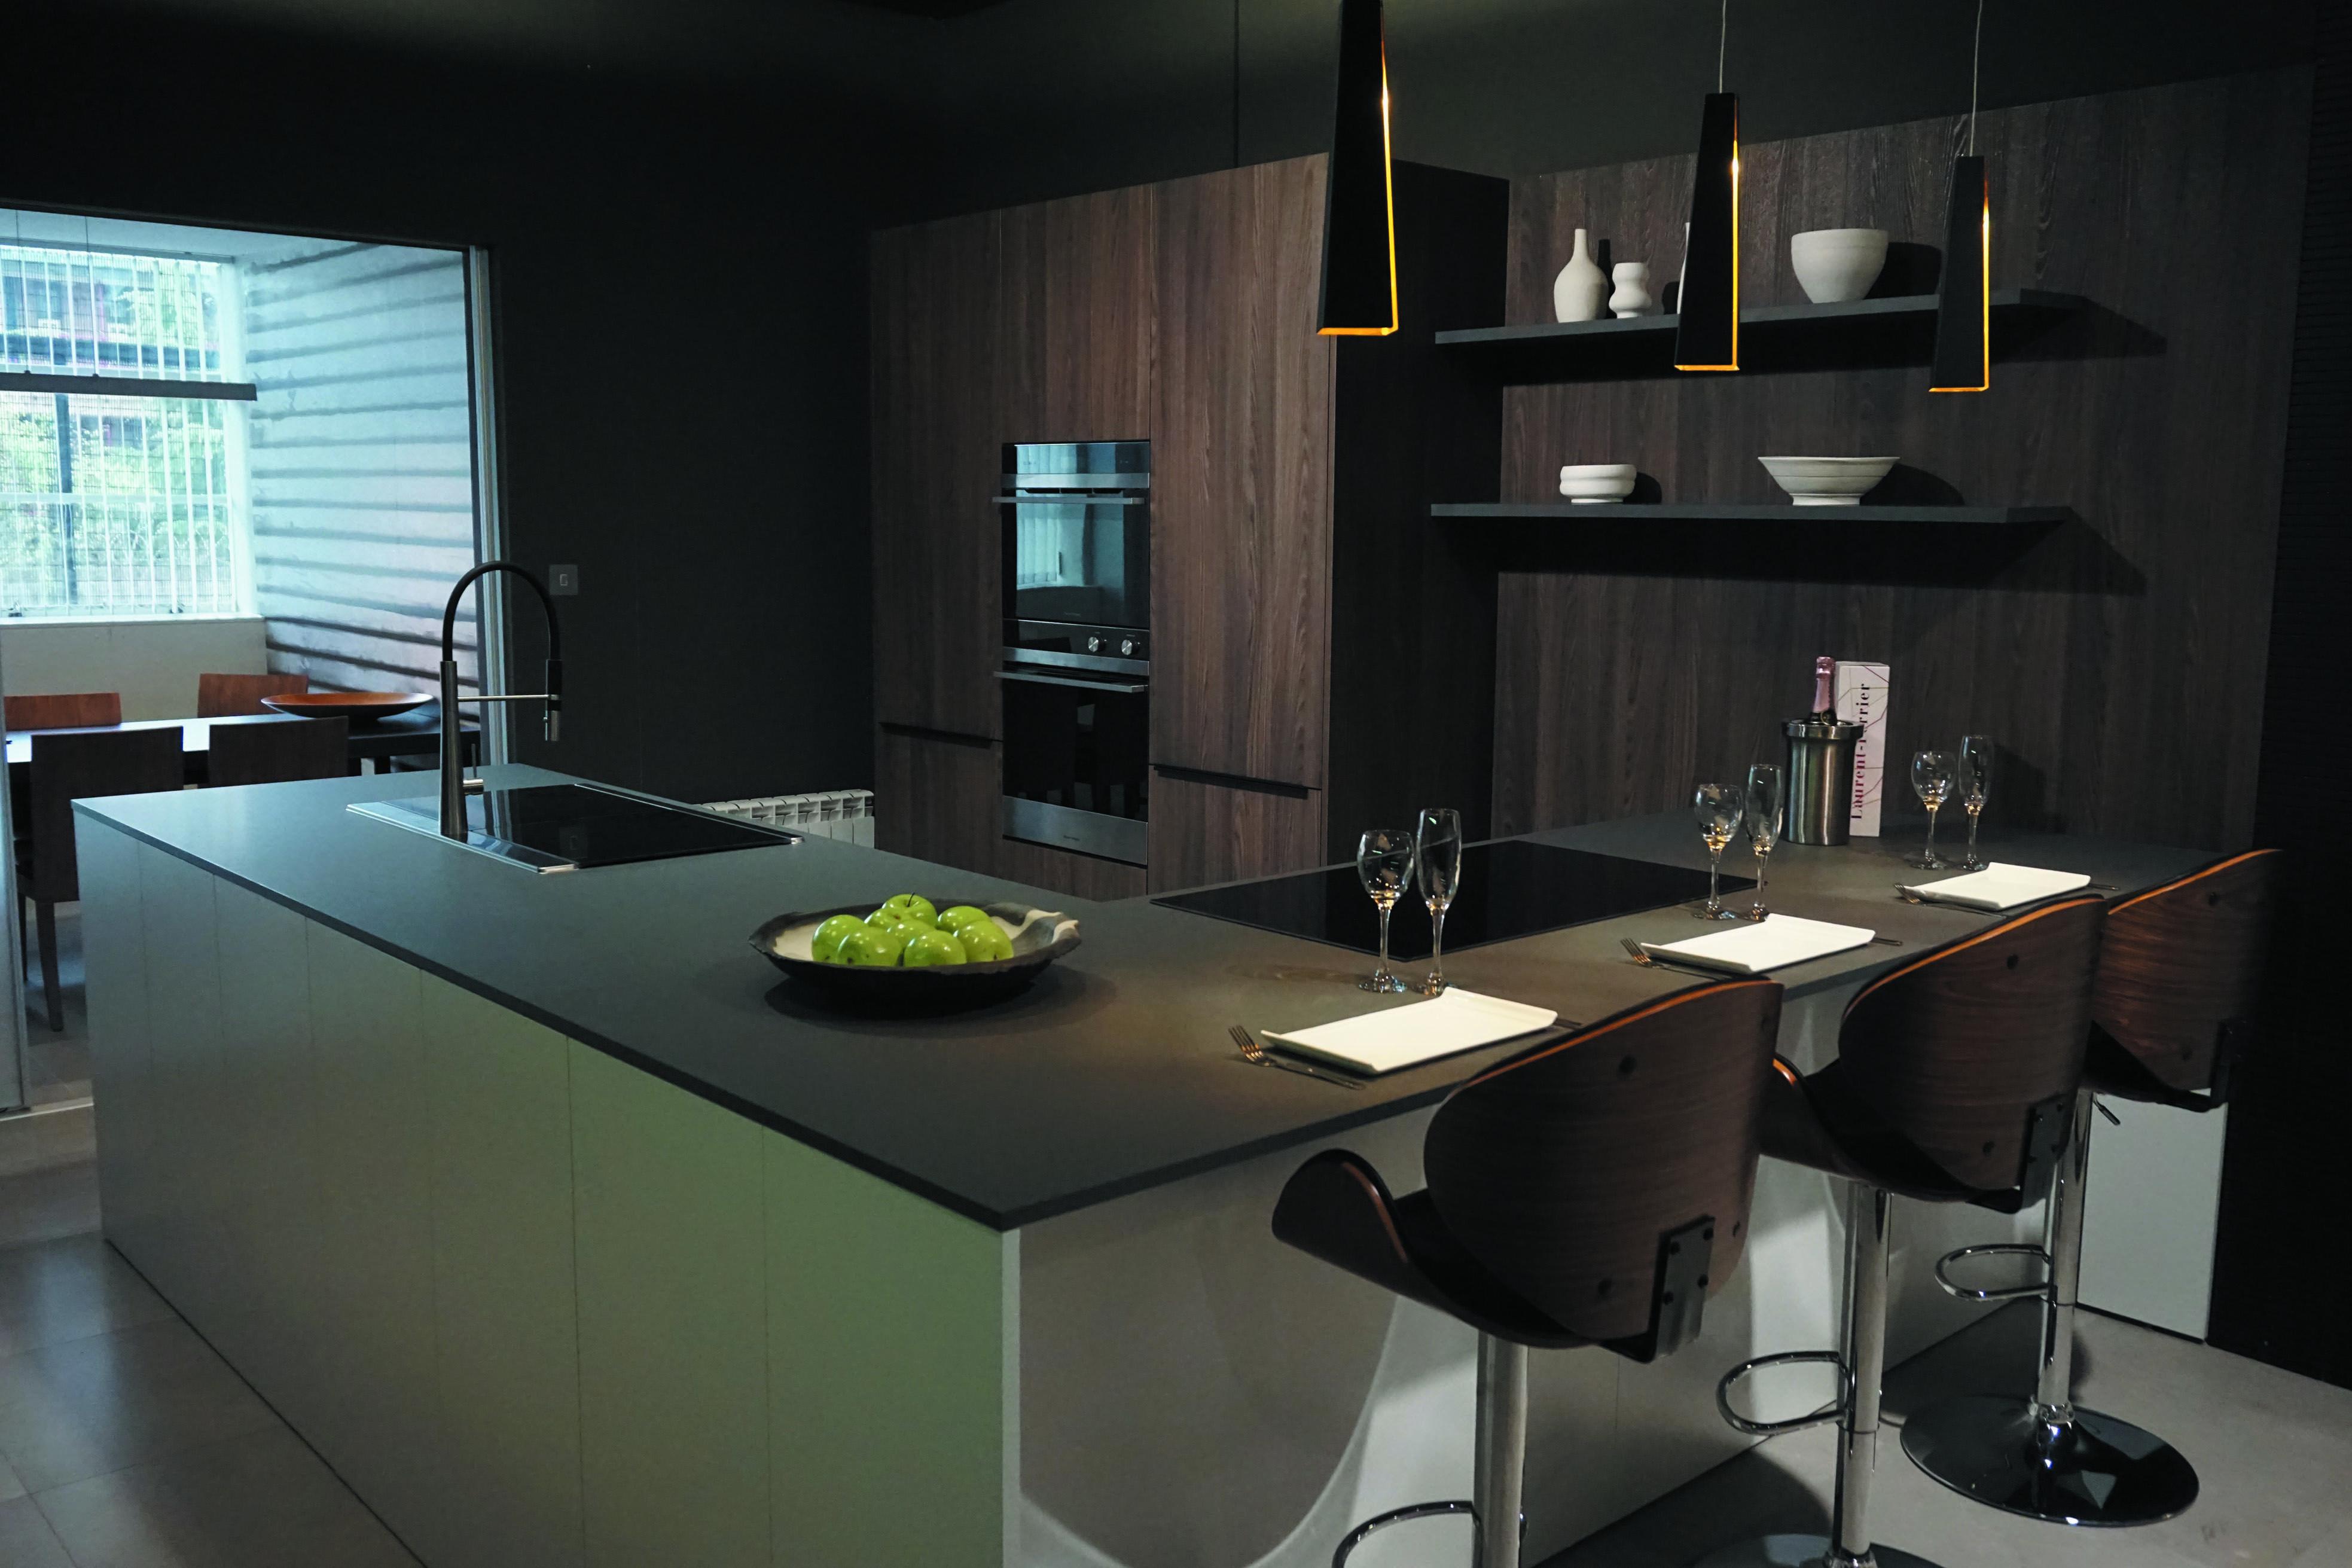 Spanish furniture brand, Xey UK, add a stylish new kitchen